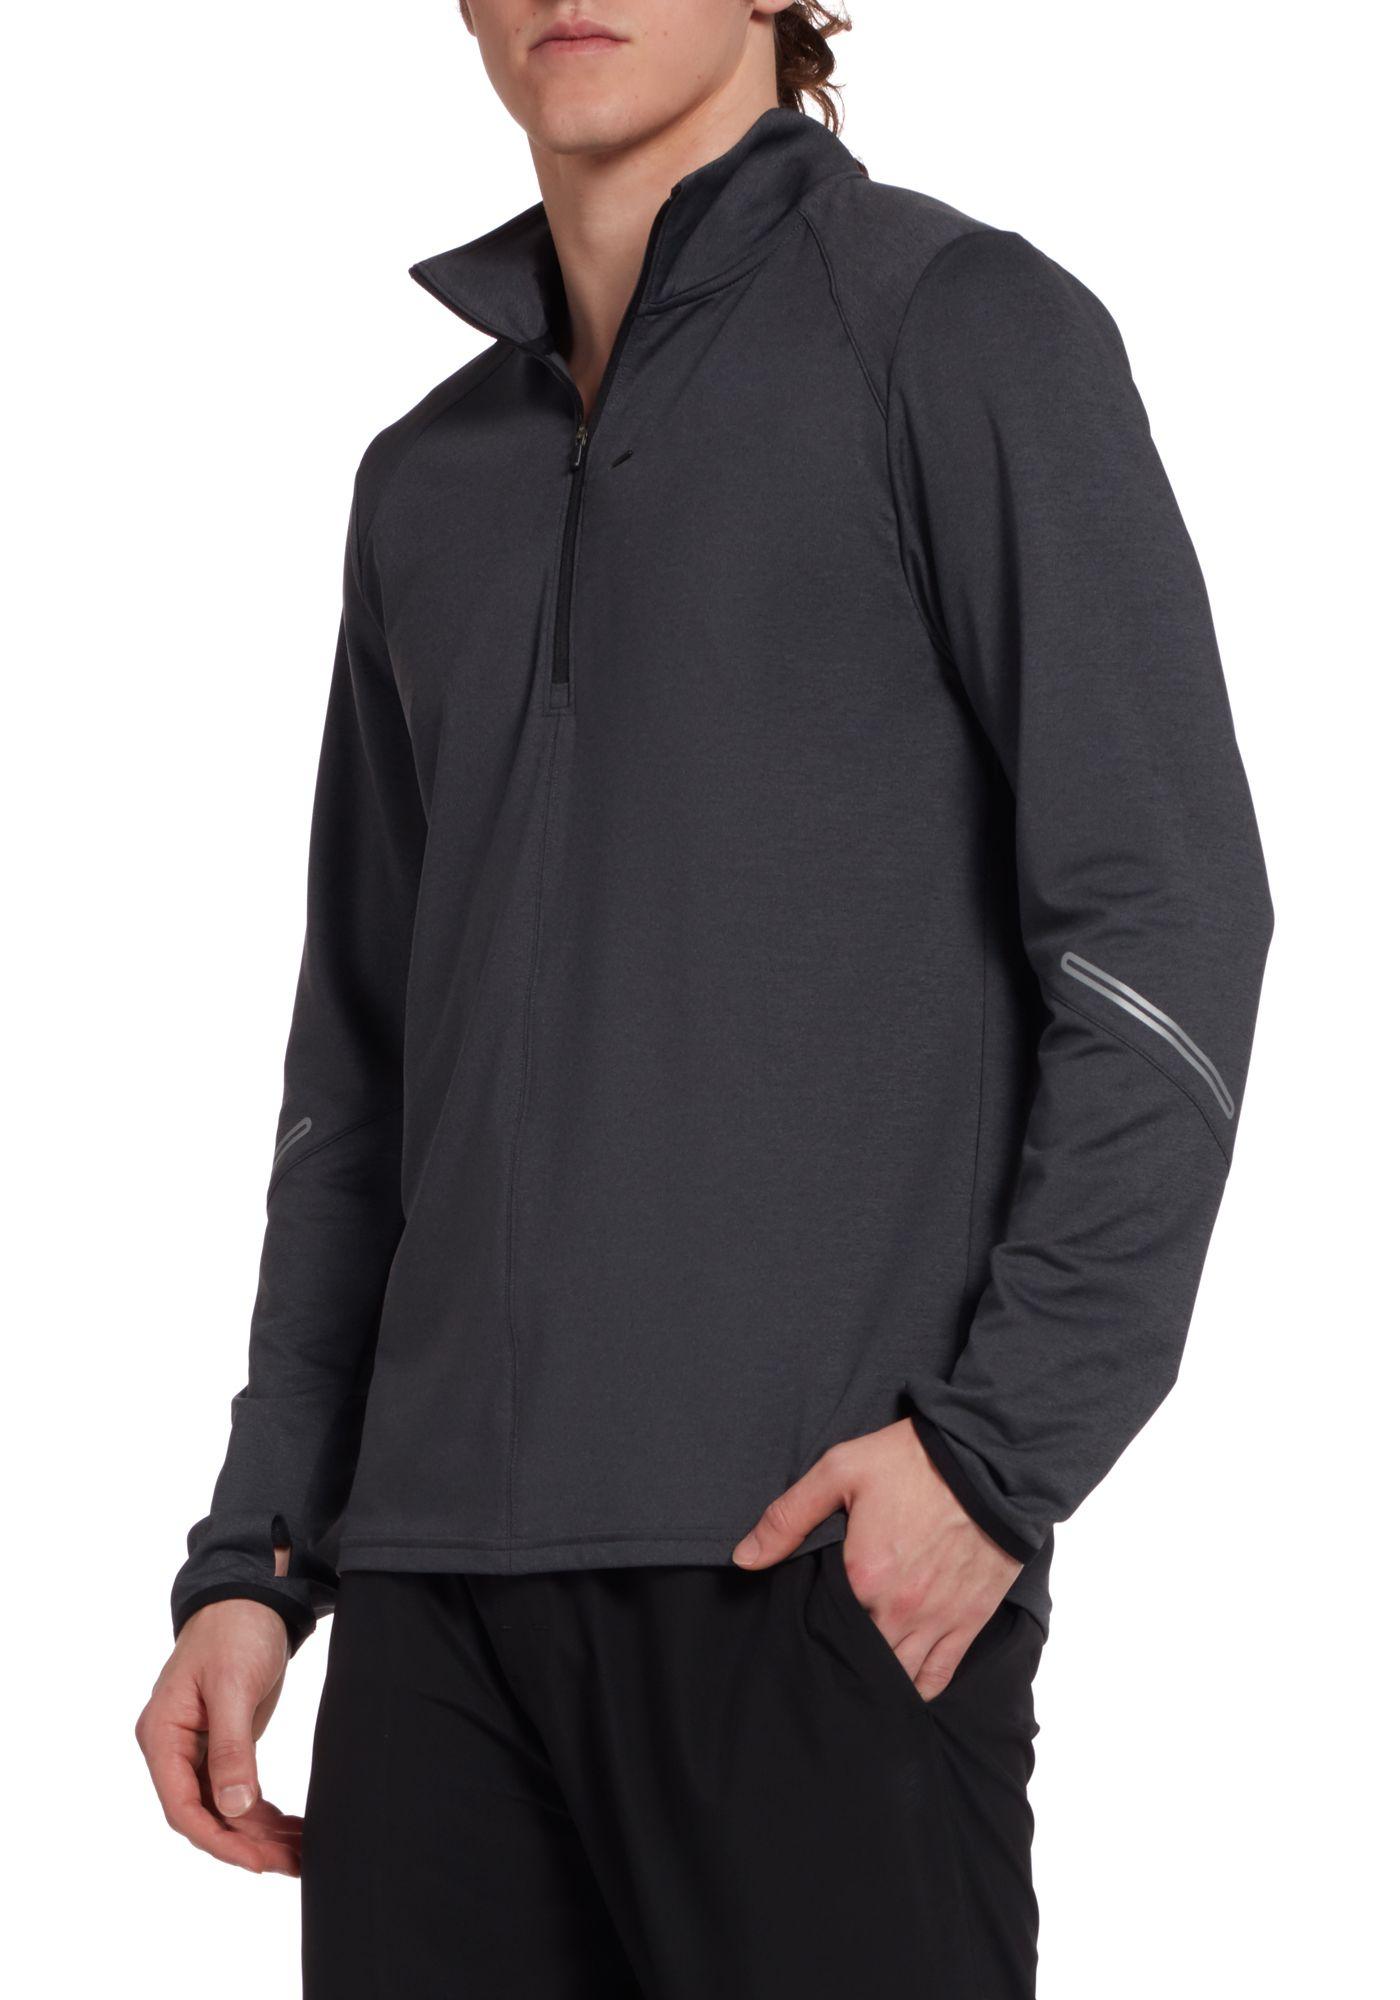 SECOND SKIN Men's Training 1/2 Zip Long Sleeve Shirt